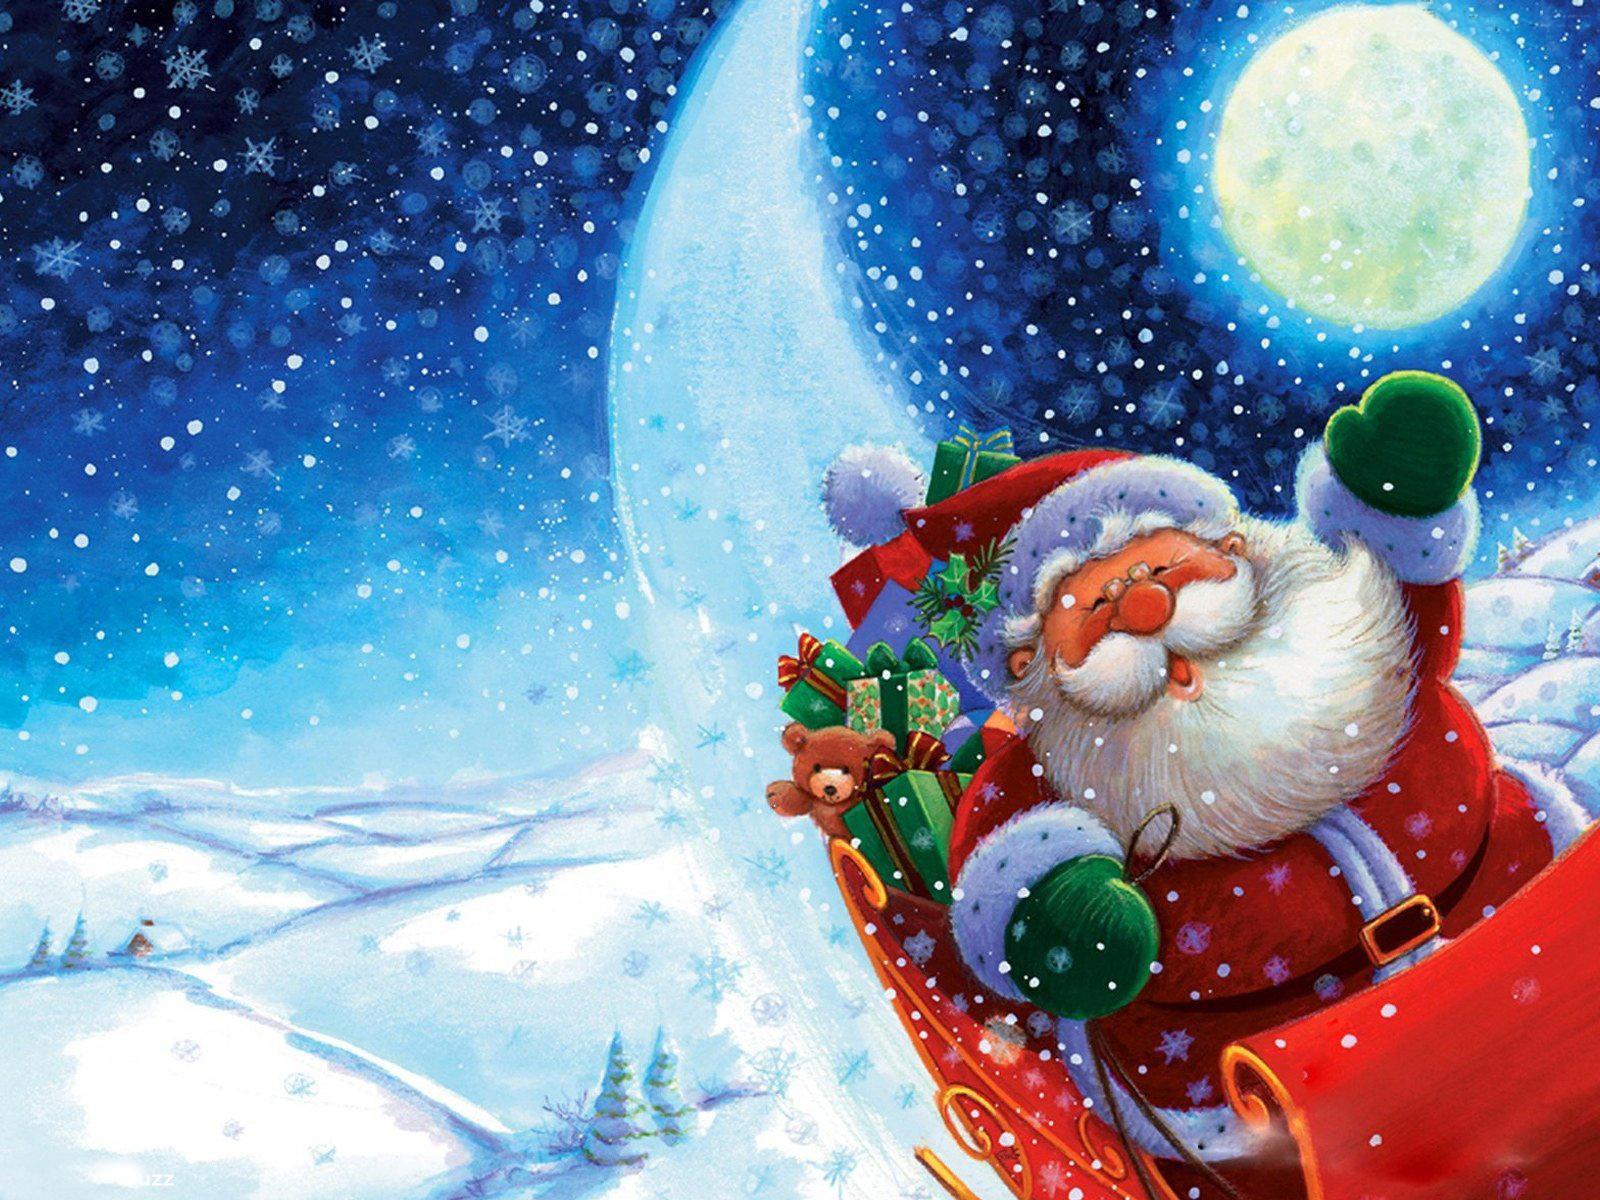 http://2.bp.blogspot.com/-PKw7OET_538/TtNeJD0woDI/AAAAAAAADm8/ExJd0oxStpQ/s1600/Santa-Sleighing-Funny-Wallpaper.jpg